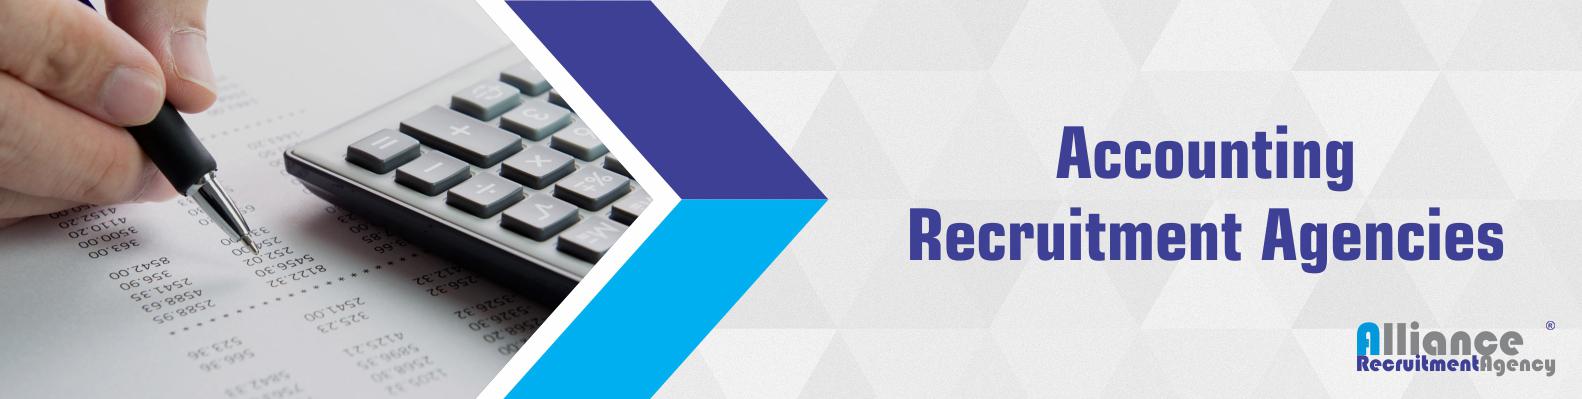 Accounting Recruitment Agencies - Top Accounting Recruitment Agencies